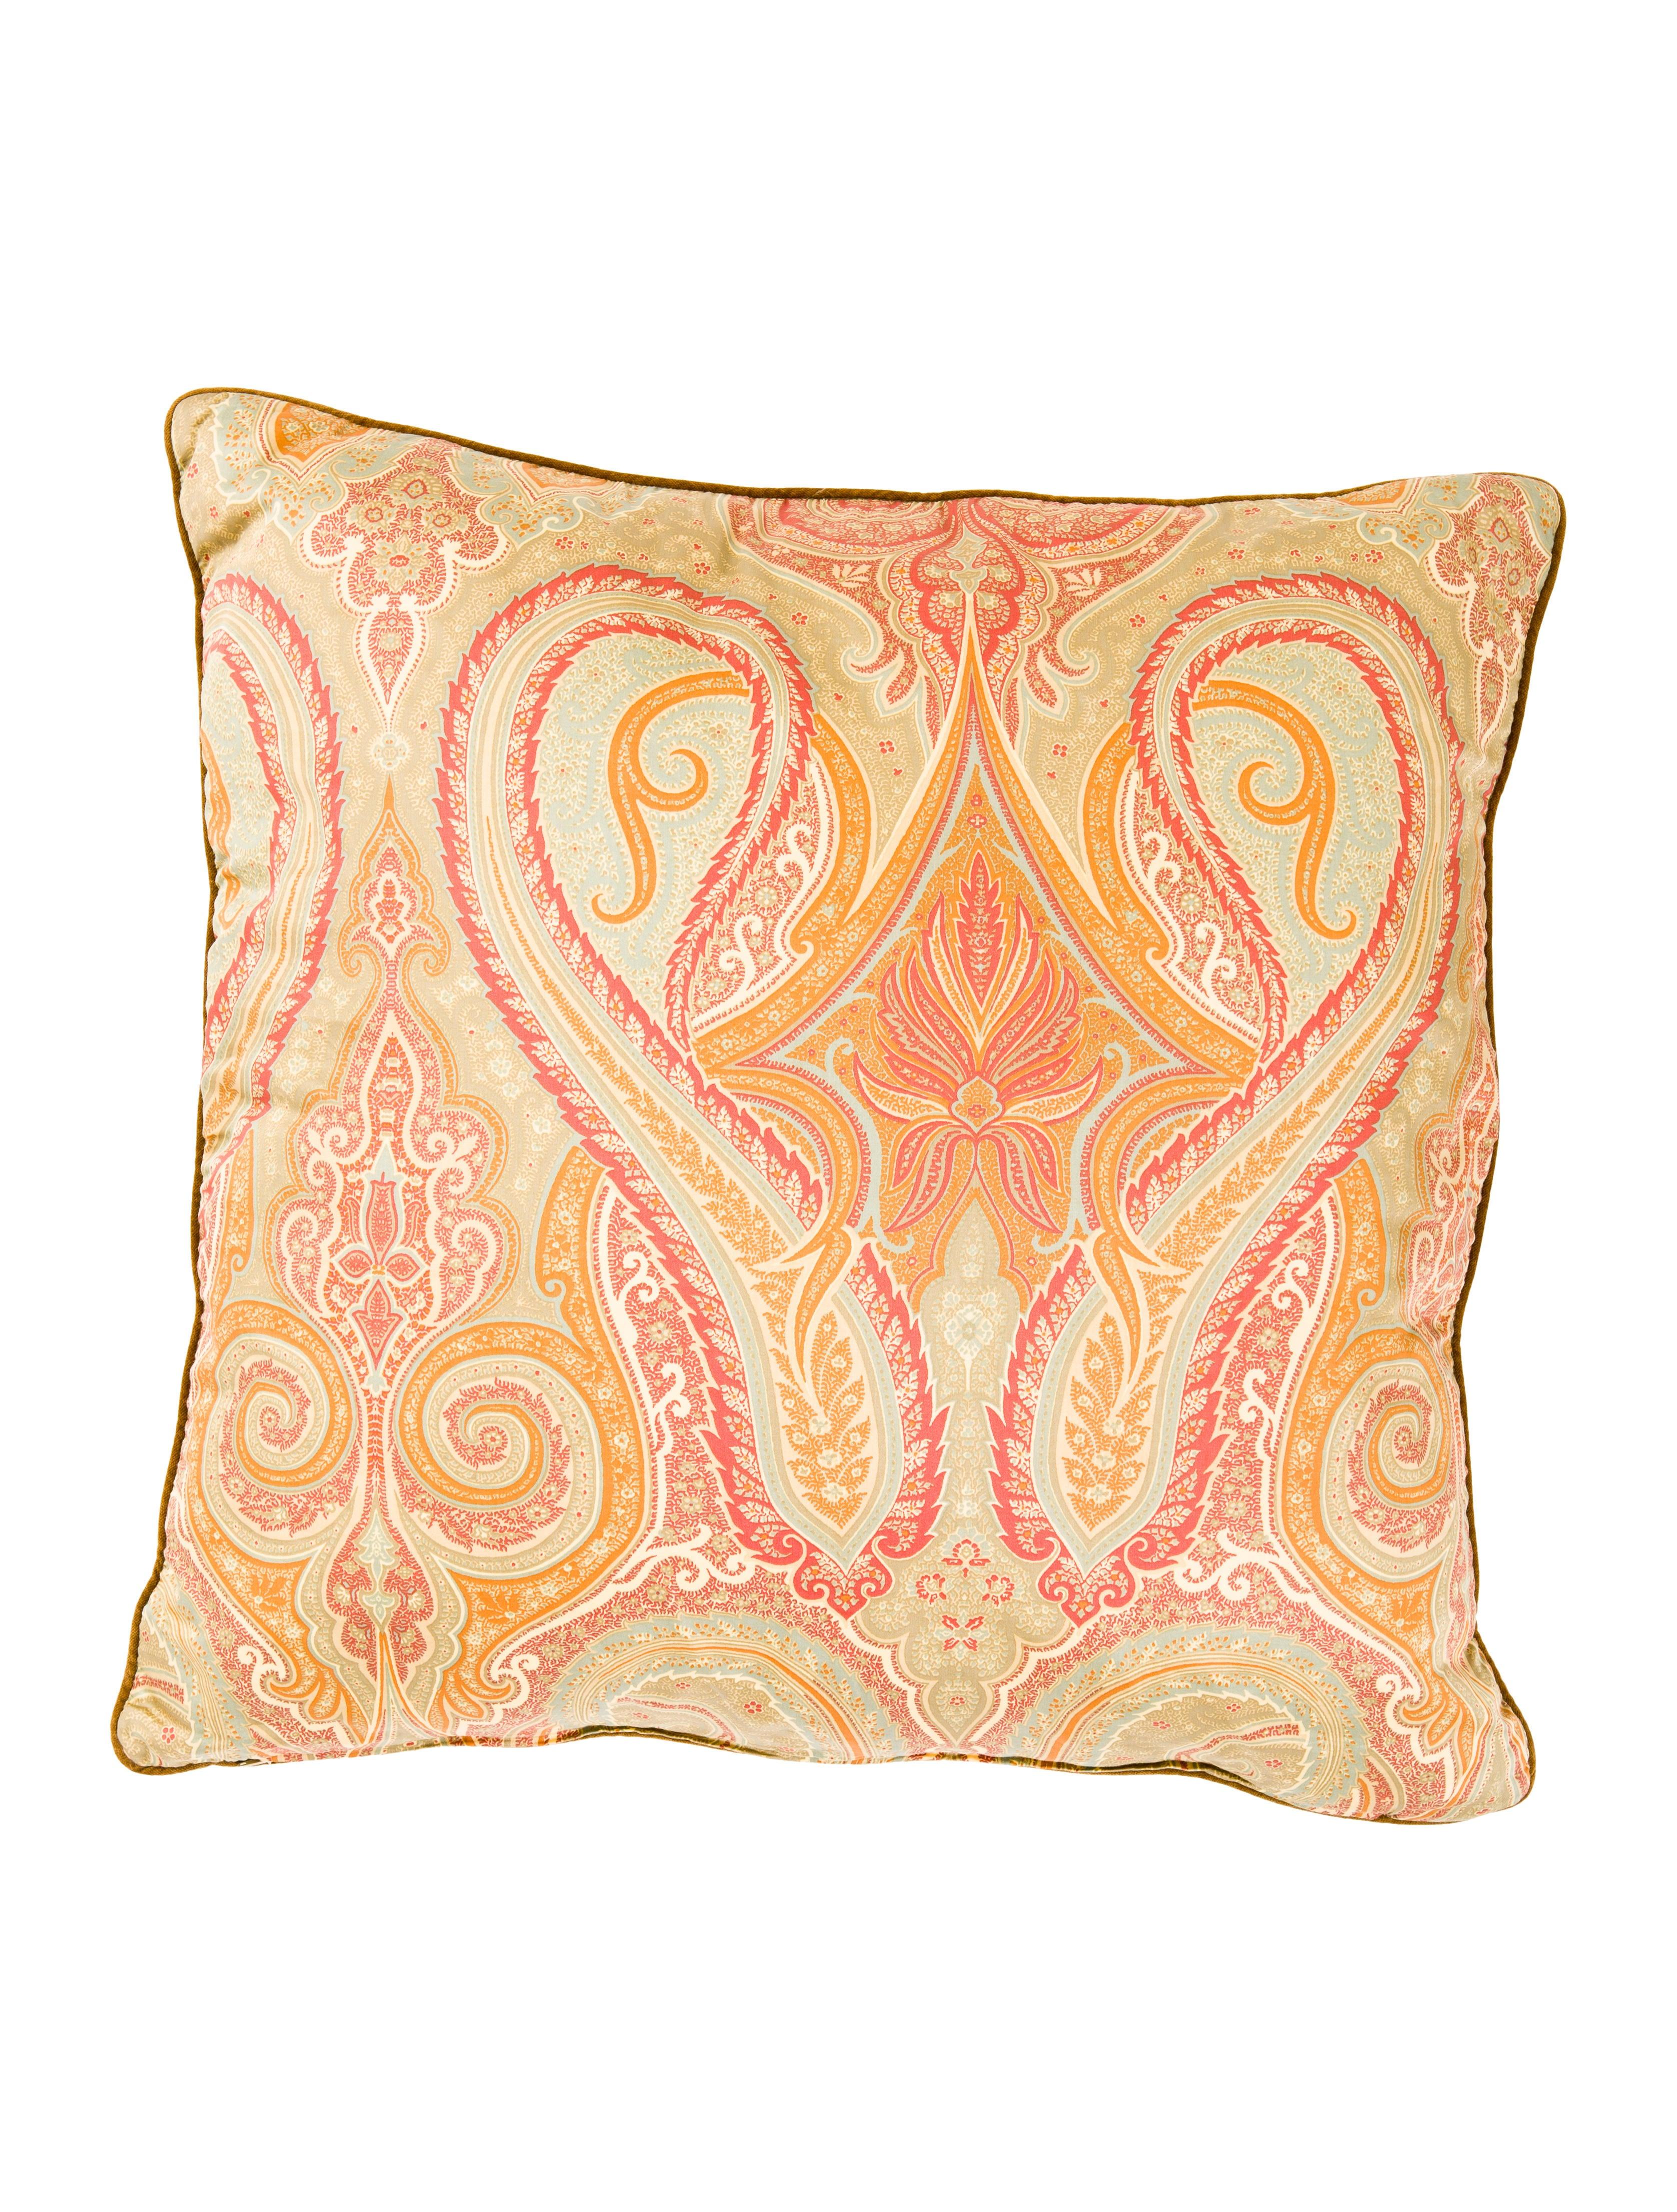 Etro Home Throw Pillow - Pillows And Throws - ETH20046 ...